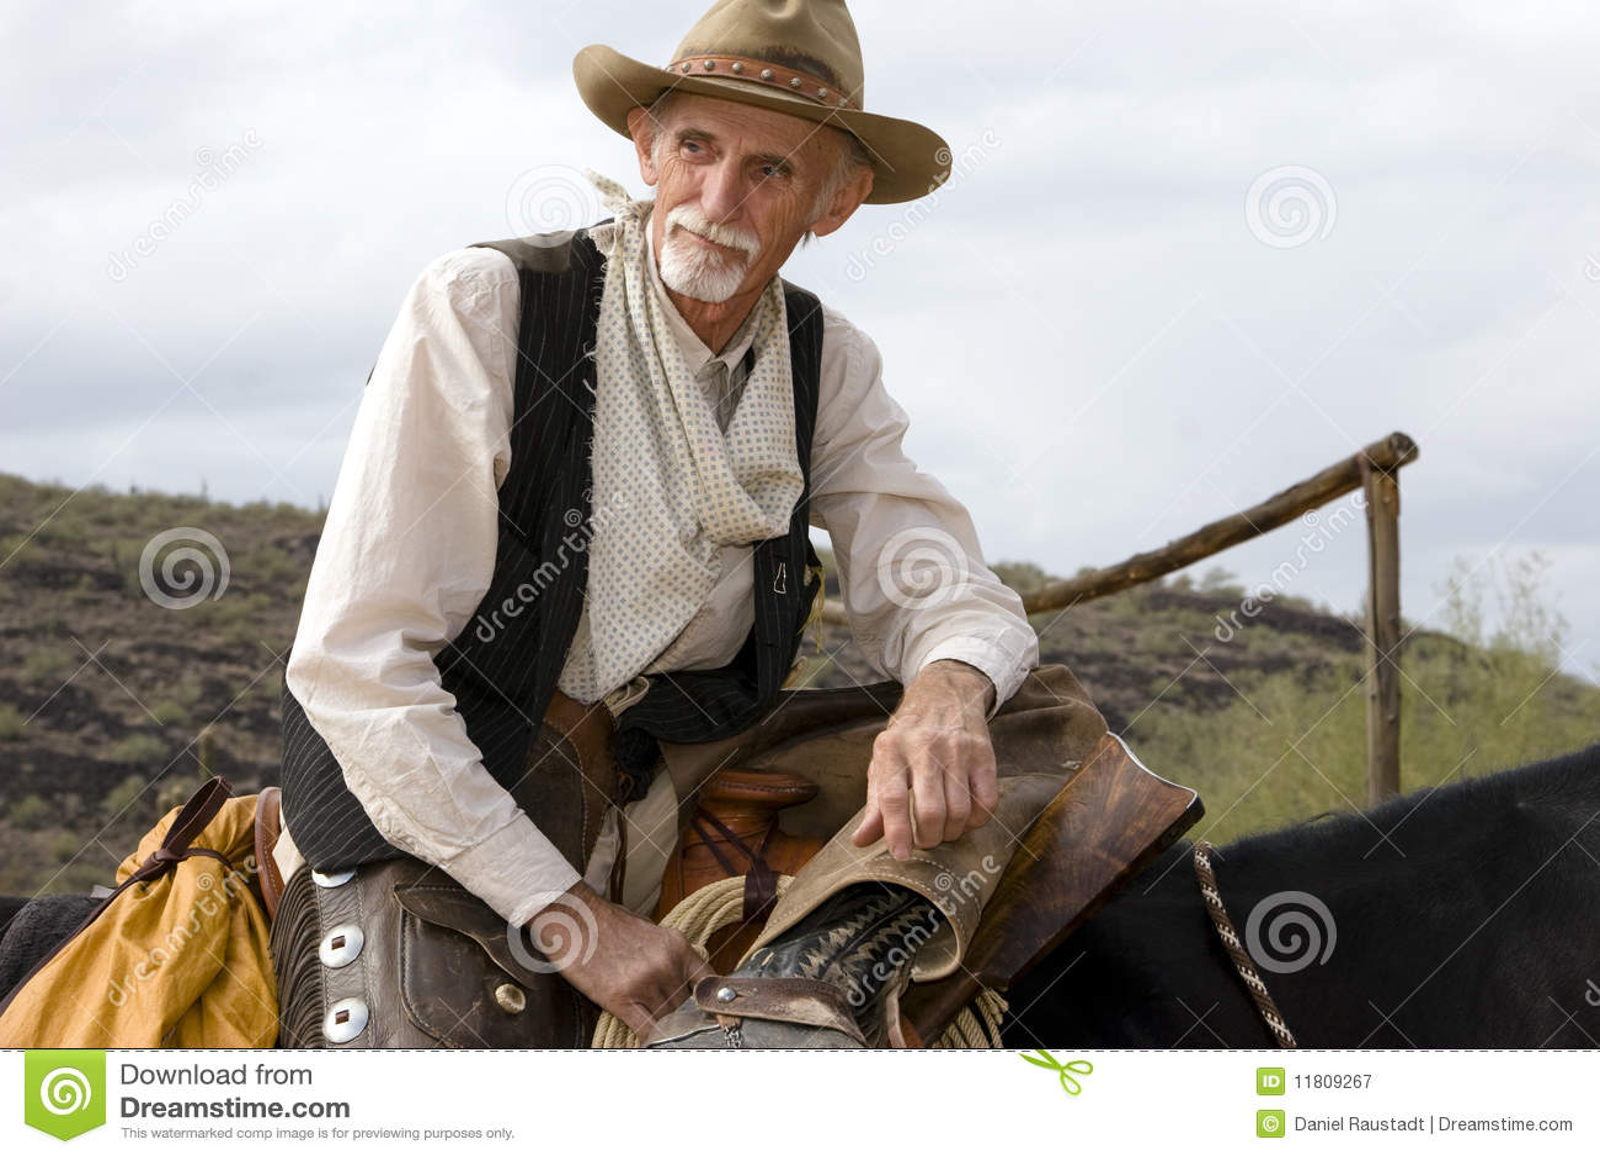 Vaquero americano occidental del viejo Cowhand